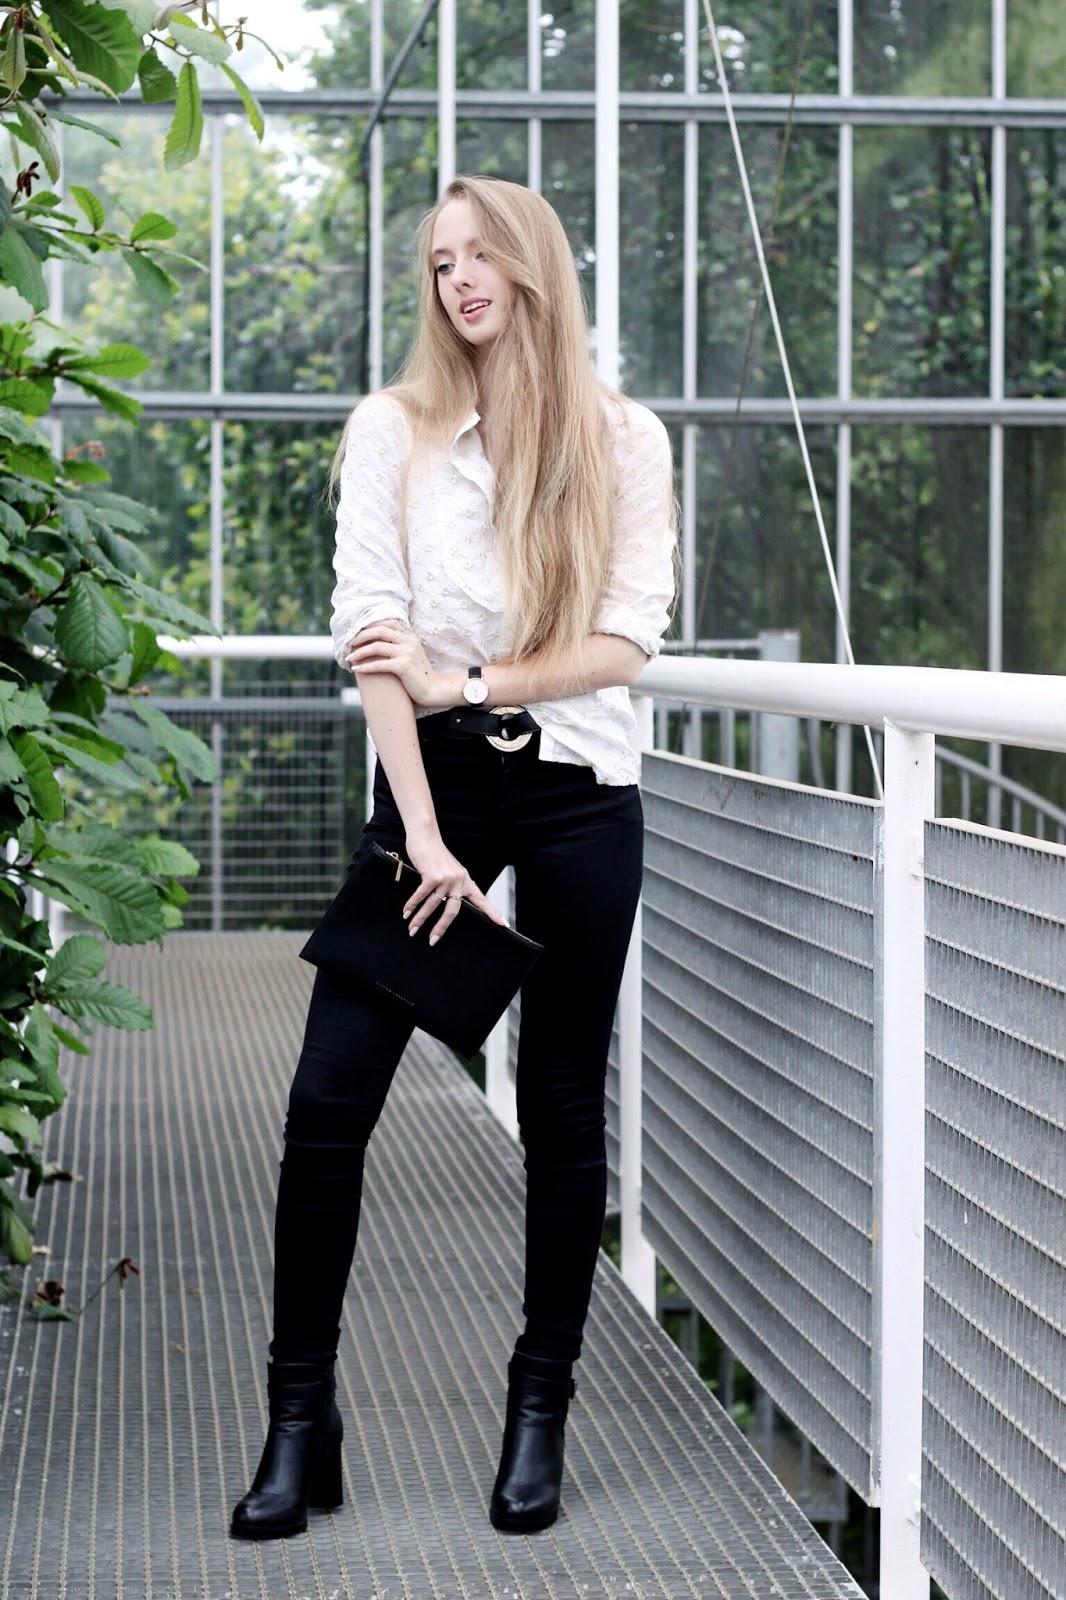 UK luxury fashion and personal style blogger